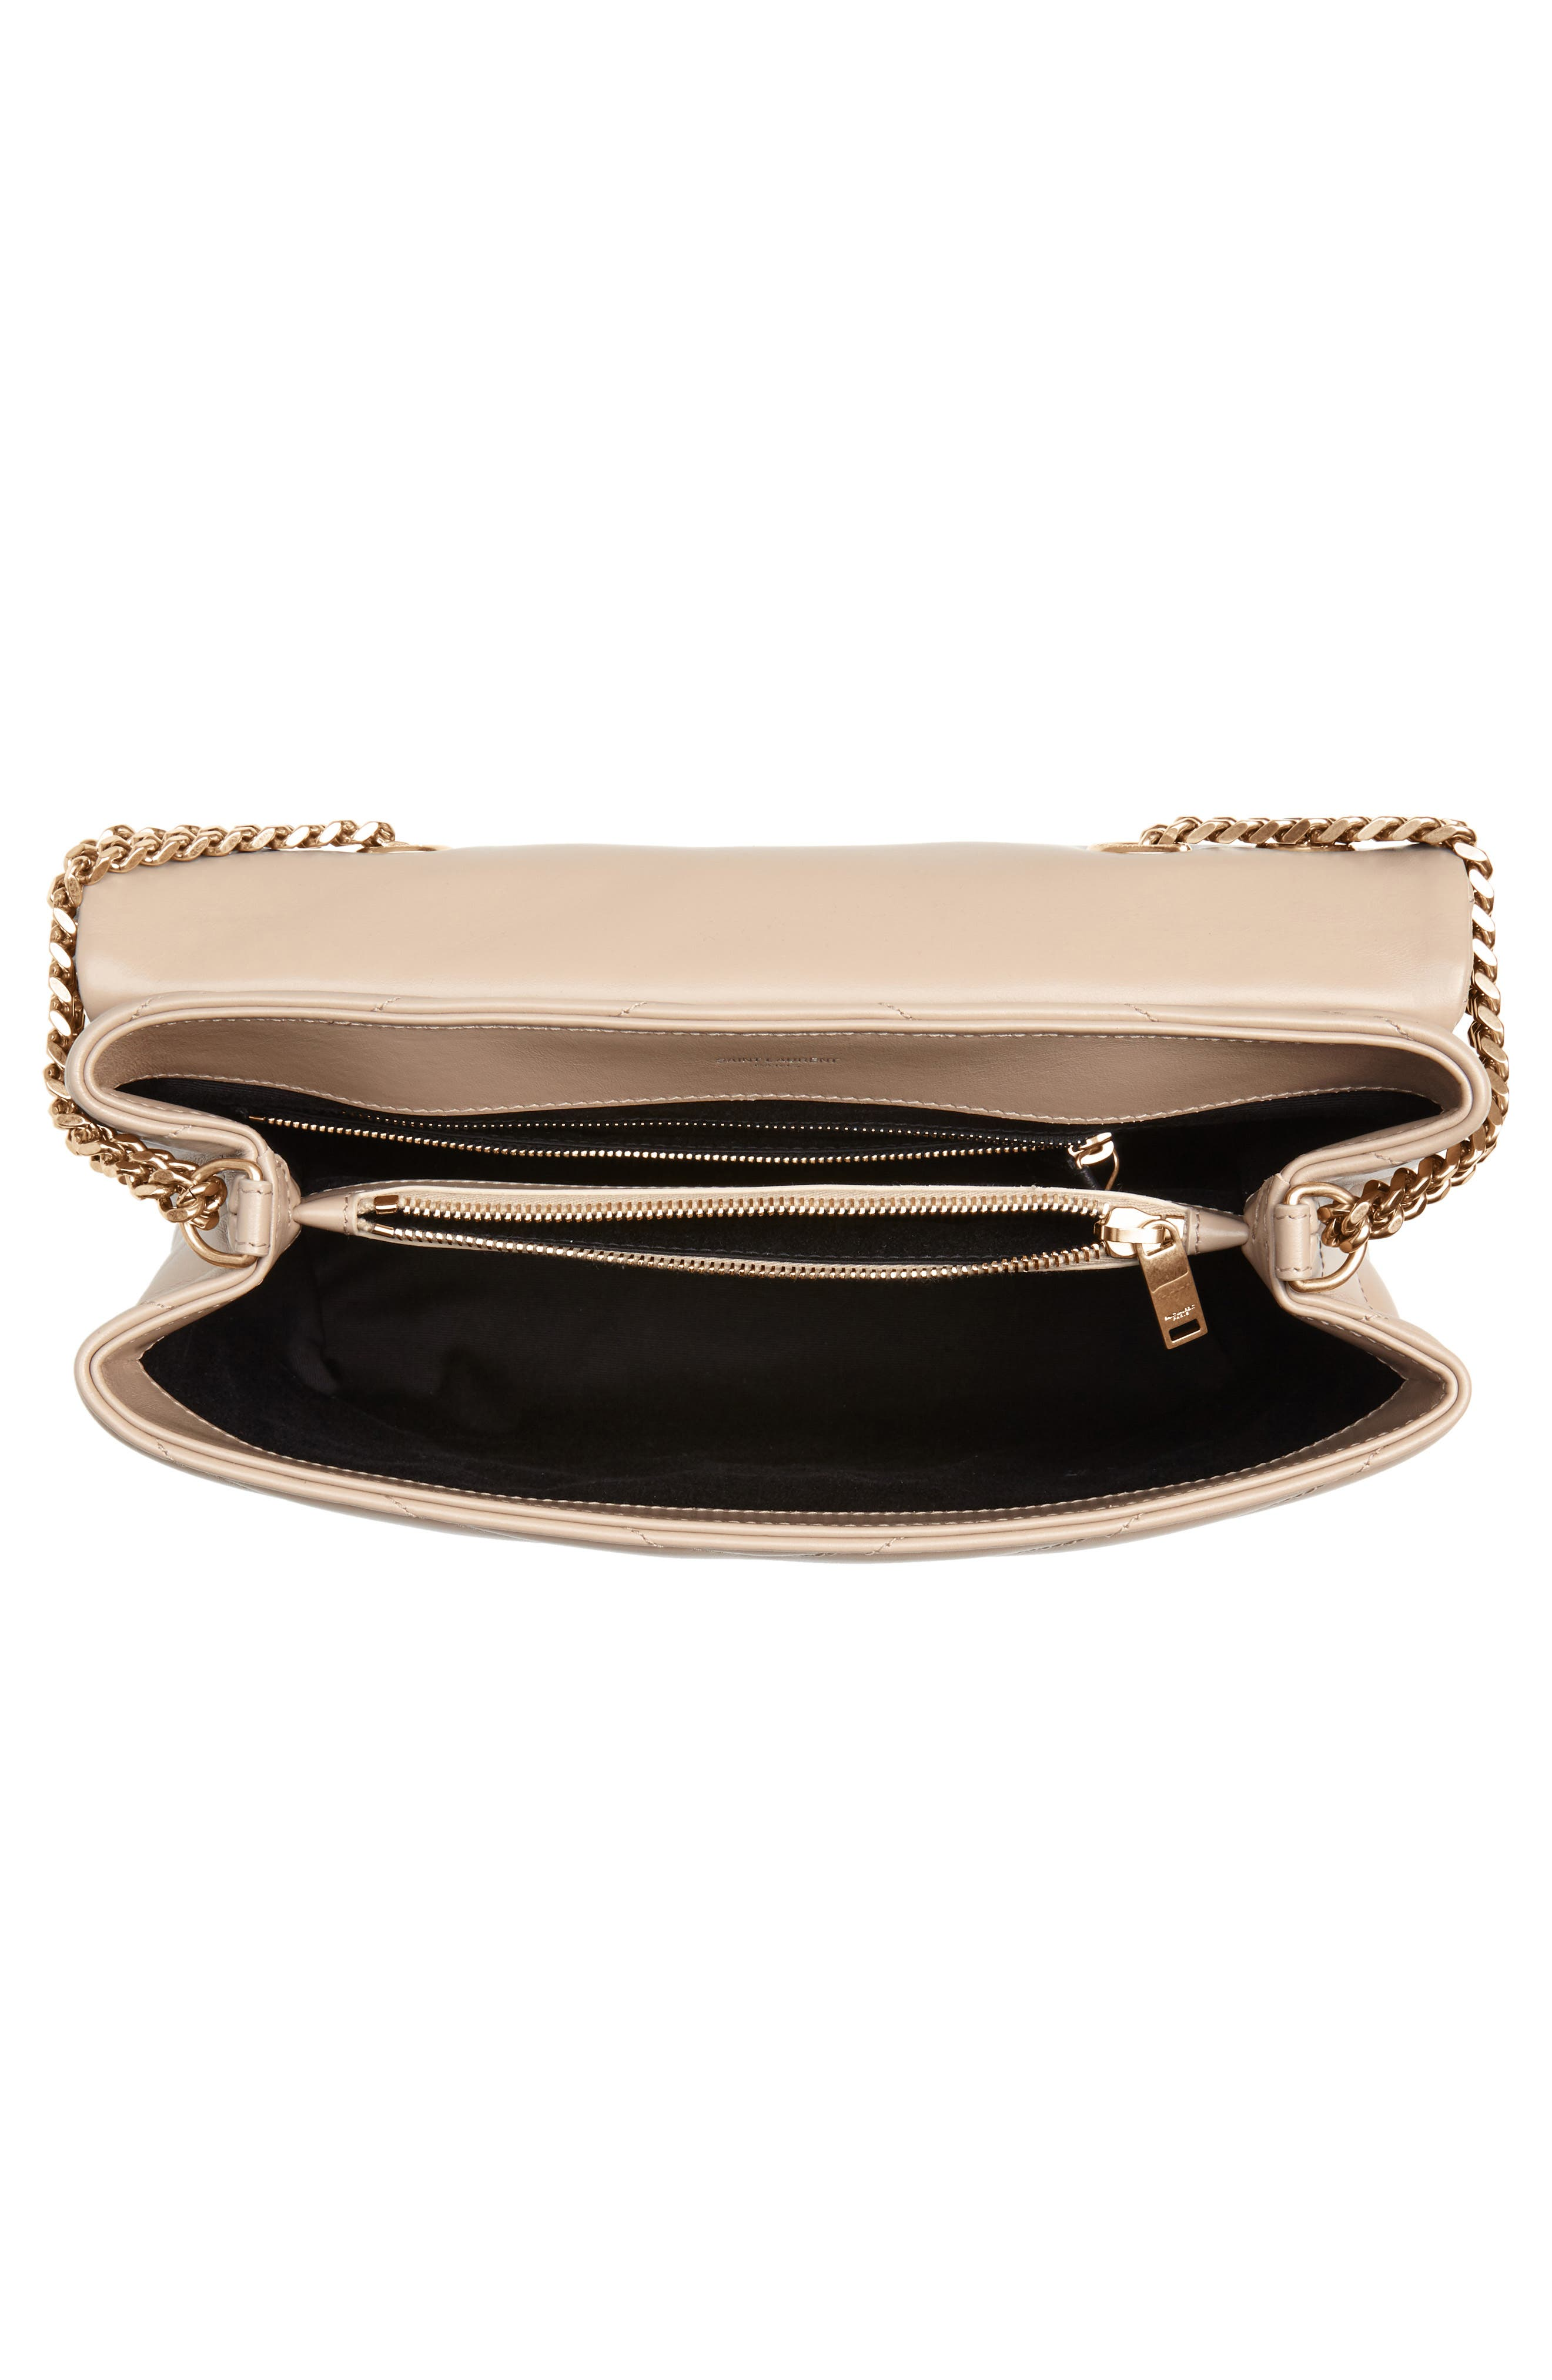 Medium Loulou Matelassé Calfskin Leather Shoulder Bag,                             Alternate thumbnail 4, color,                             LIGHT NATURAL